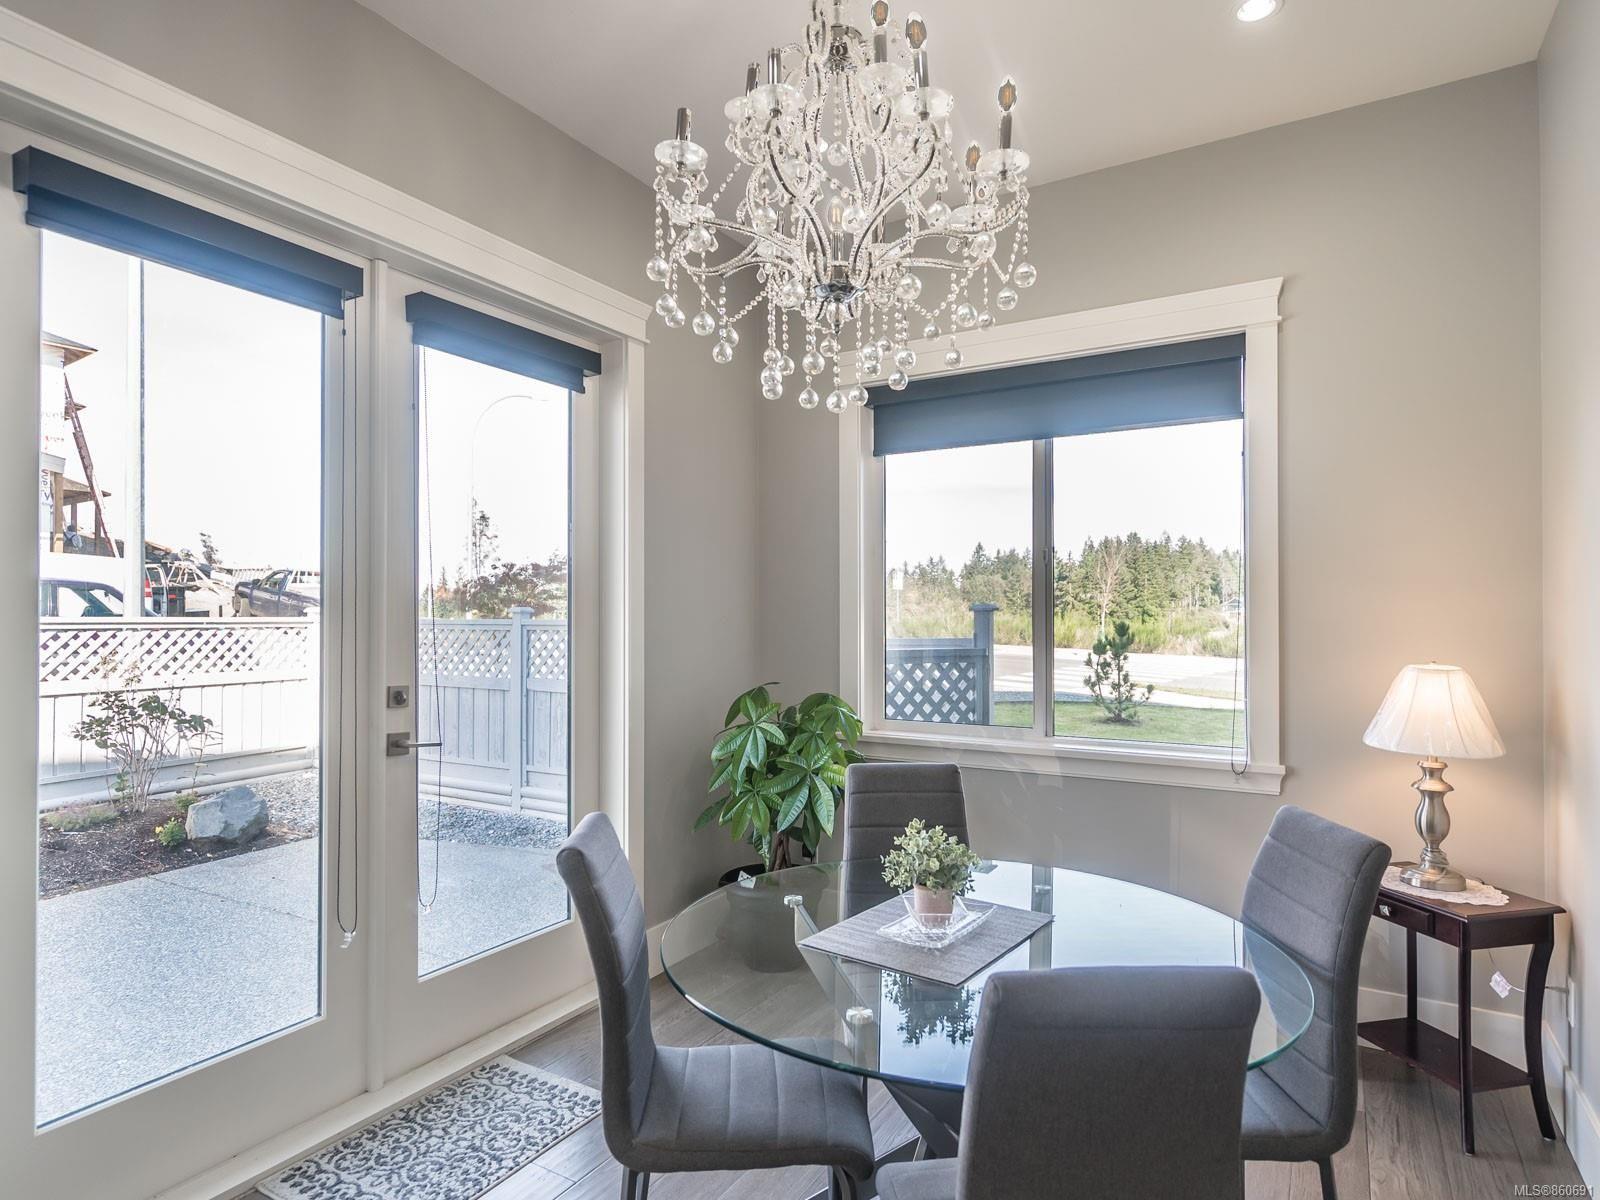 Photo 16: Photos: 5821 Linley Valley Dr in : Na North Nanaimo House for sale (Nanaimo)  : MLS®# 860691